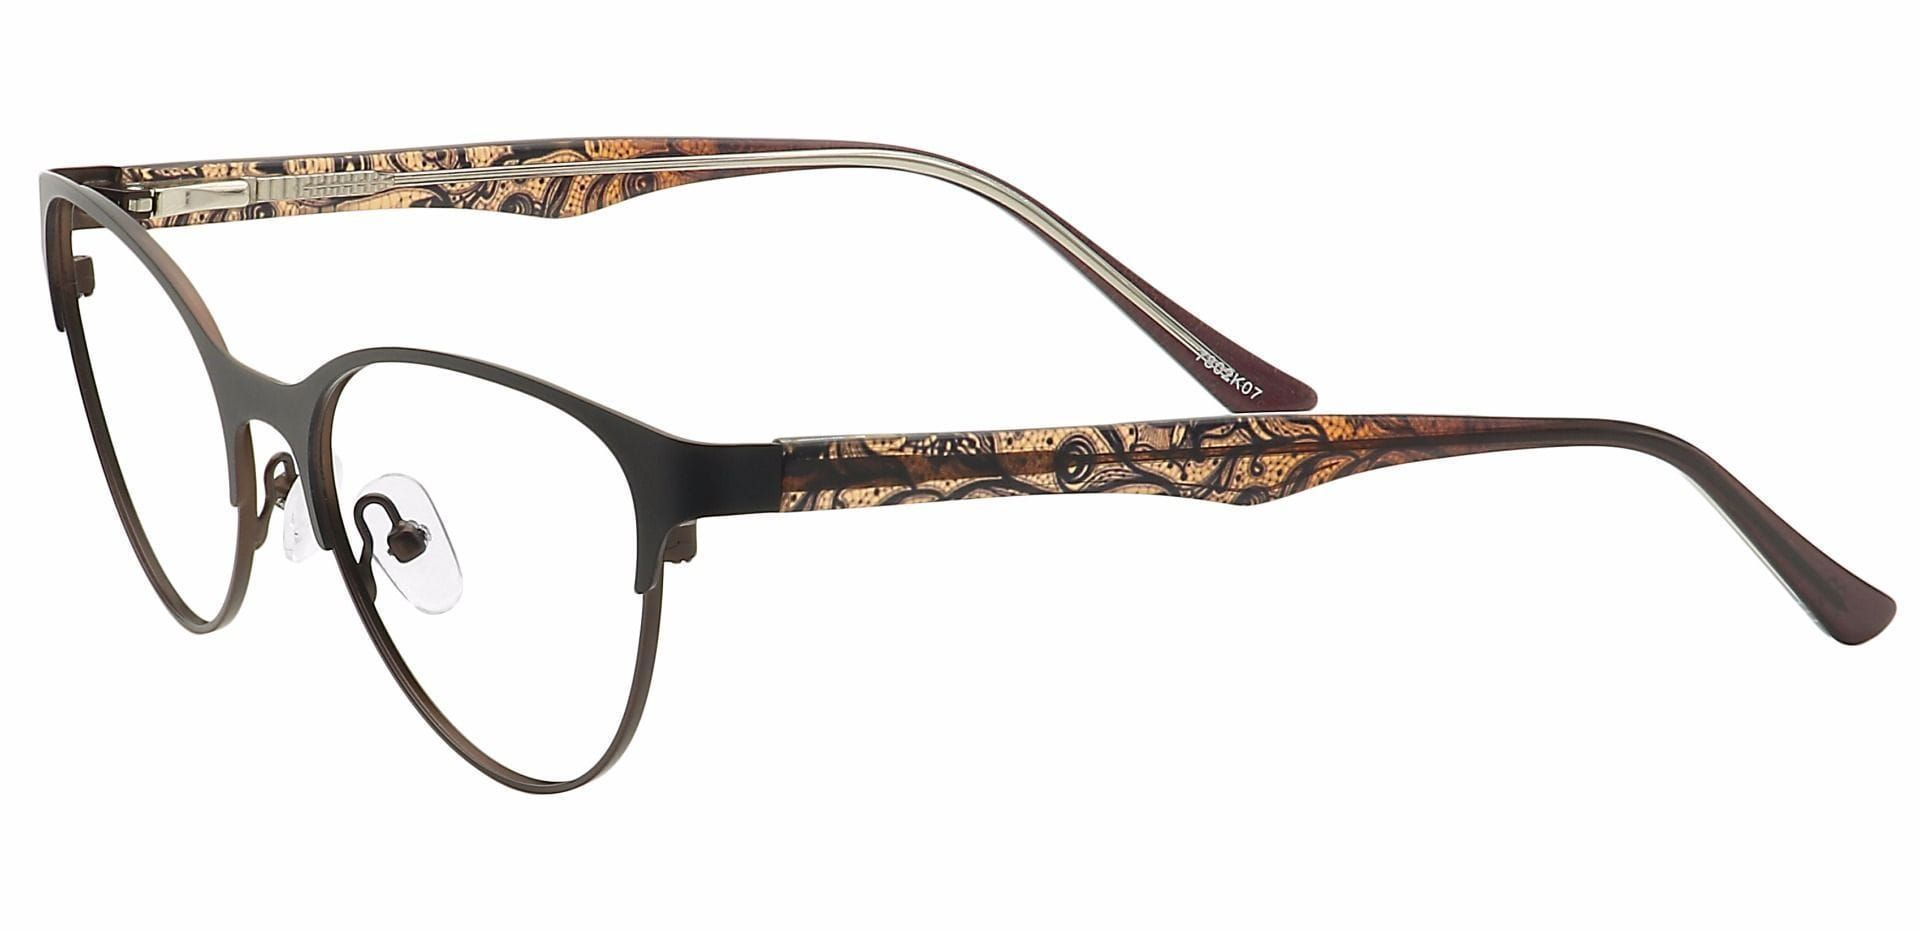 Jorde Cat-Eye Lined Bifocal Glasses - Brown